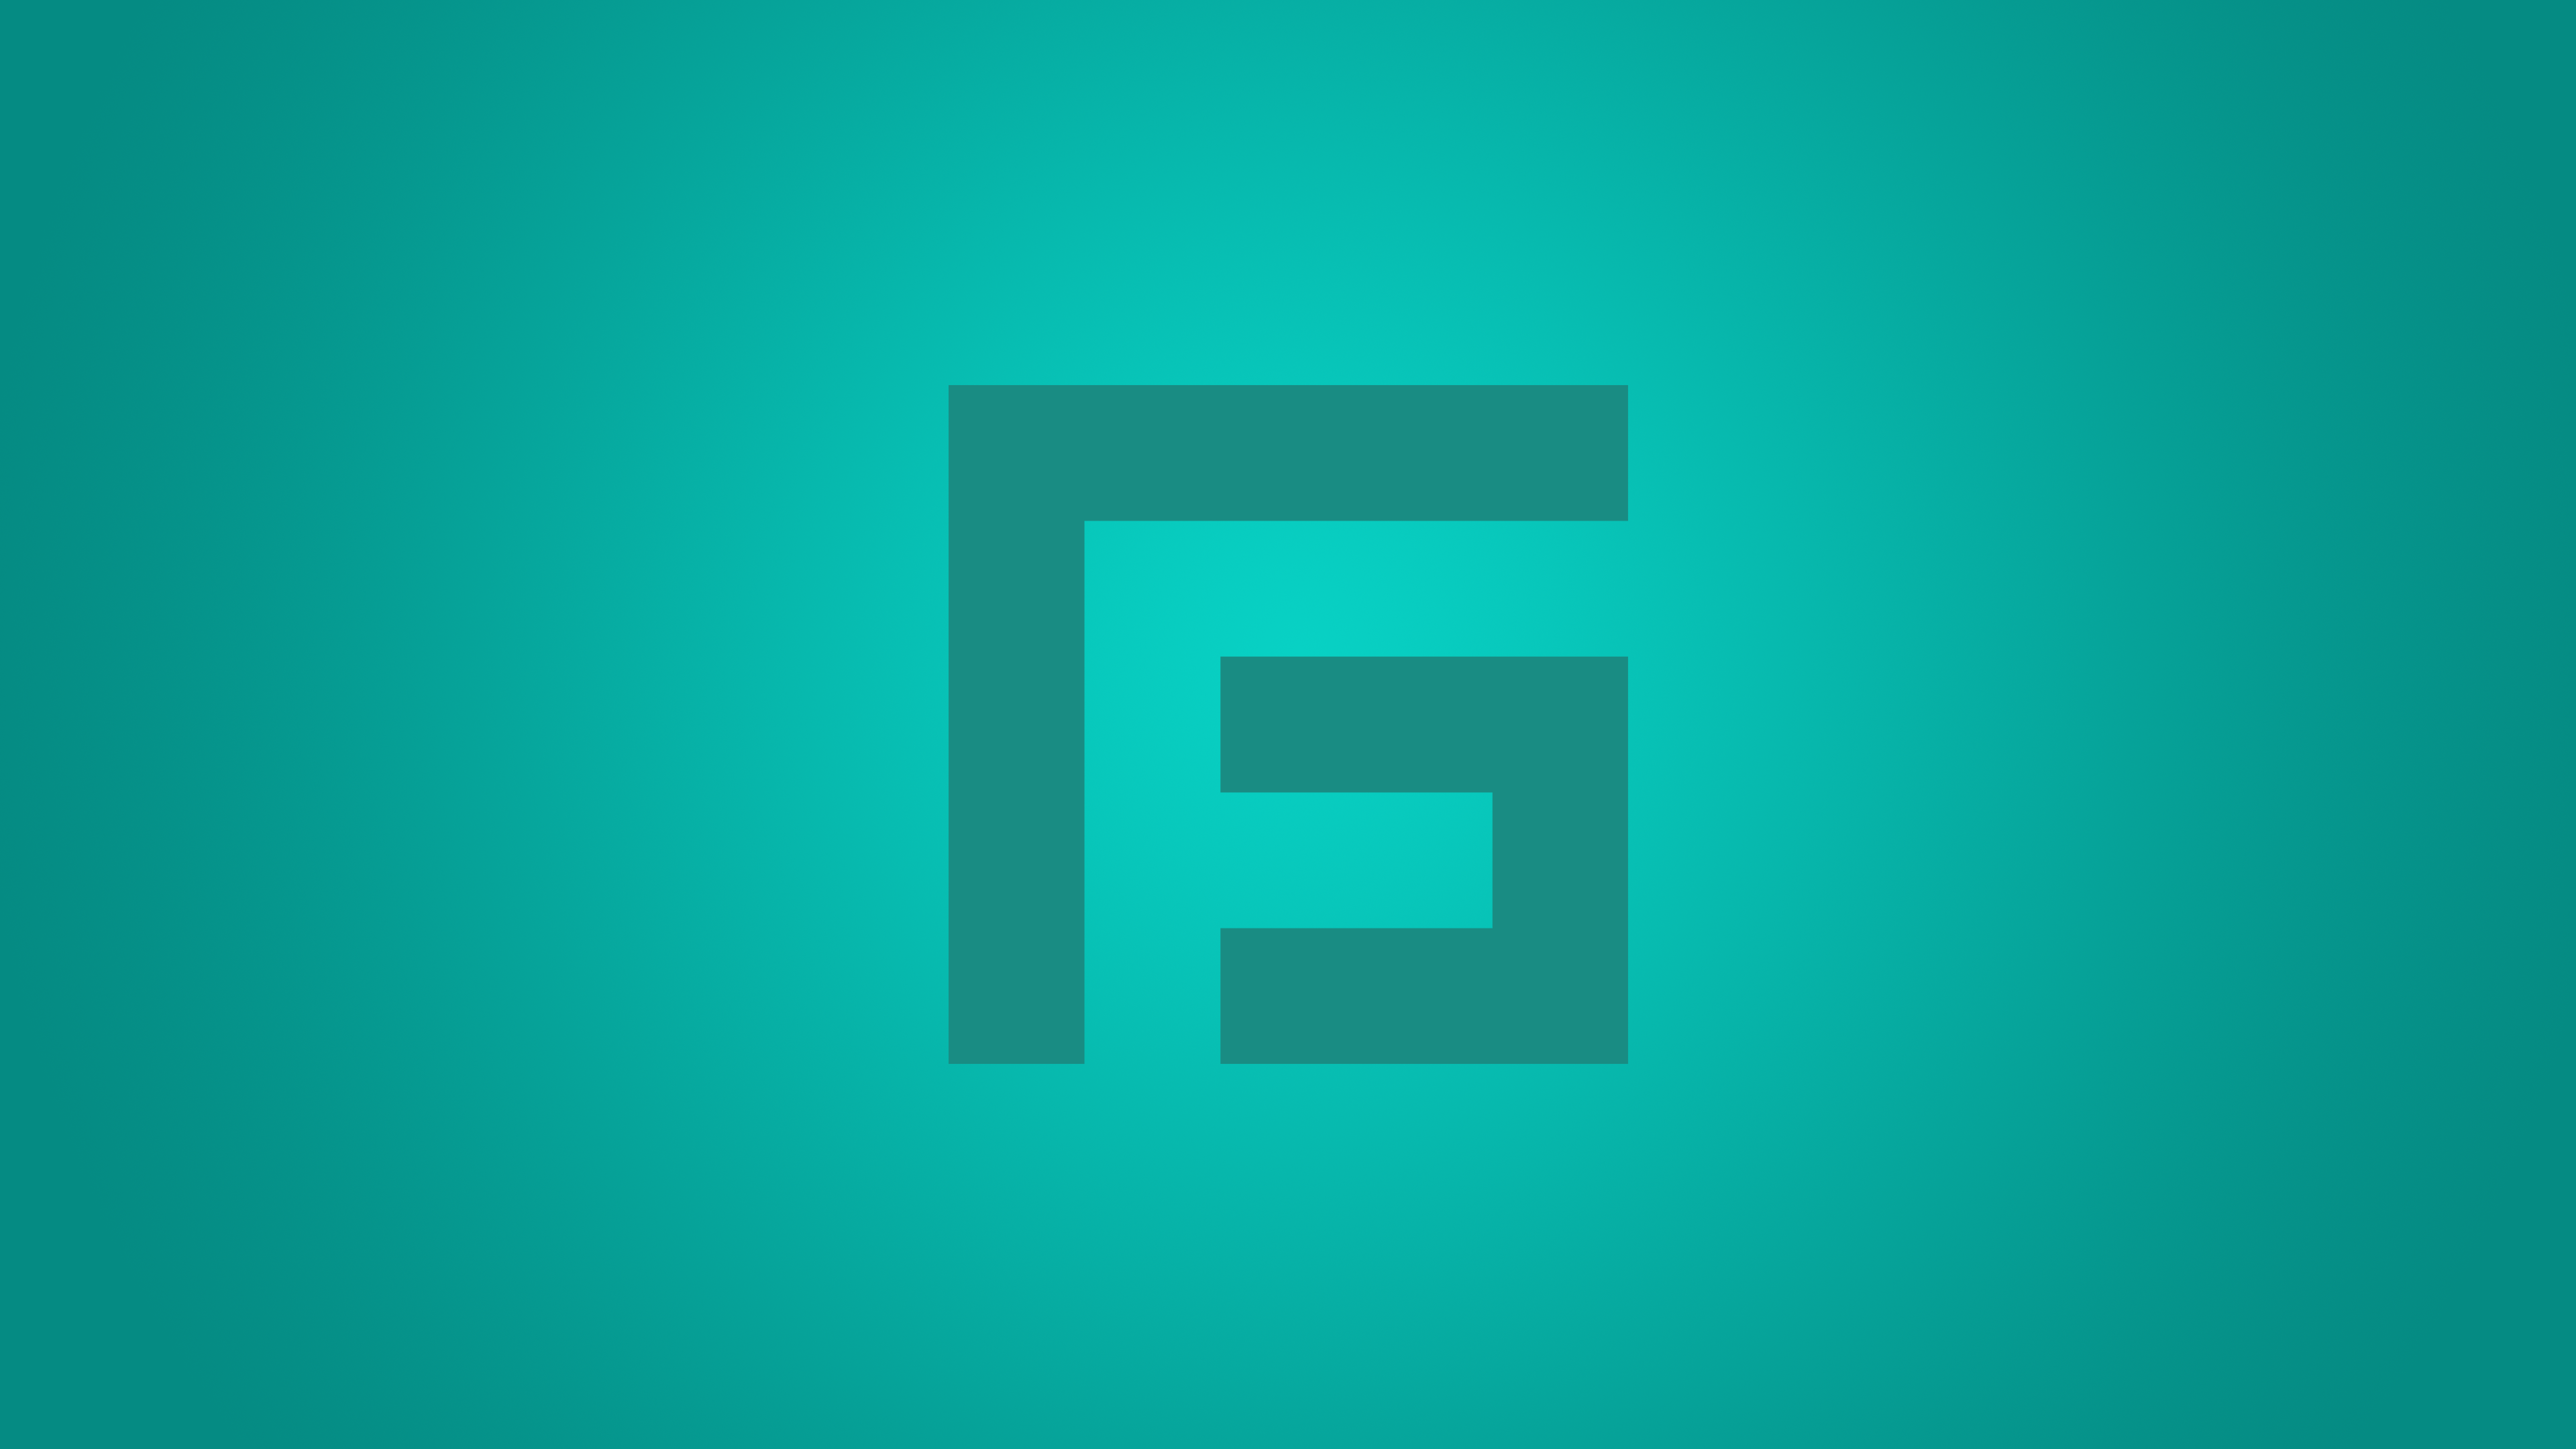 8b4ba02c301 Εργαστήρι Steam :: [GER] Freezzer Gaming - TTT